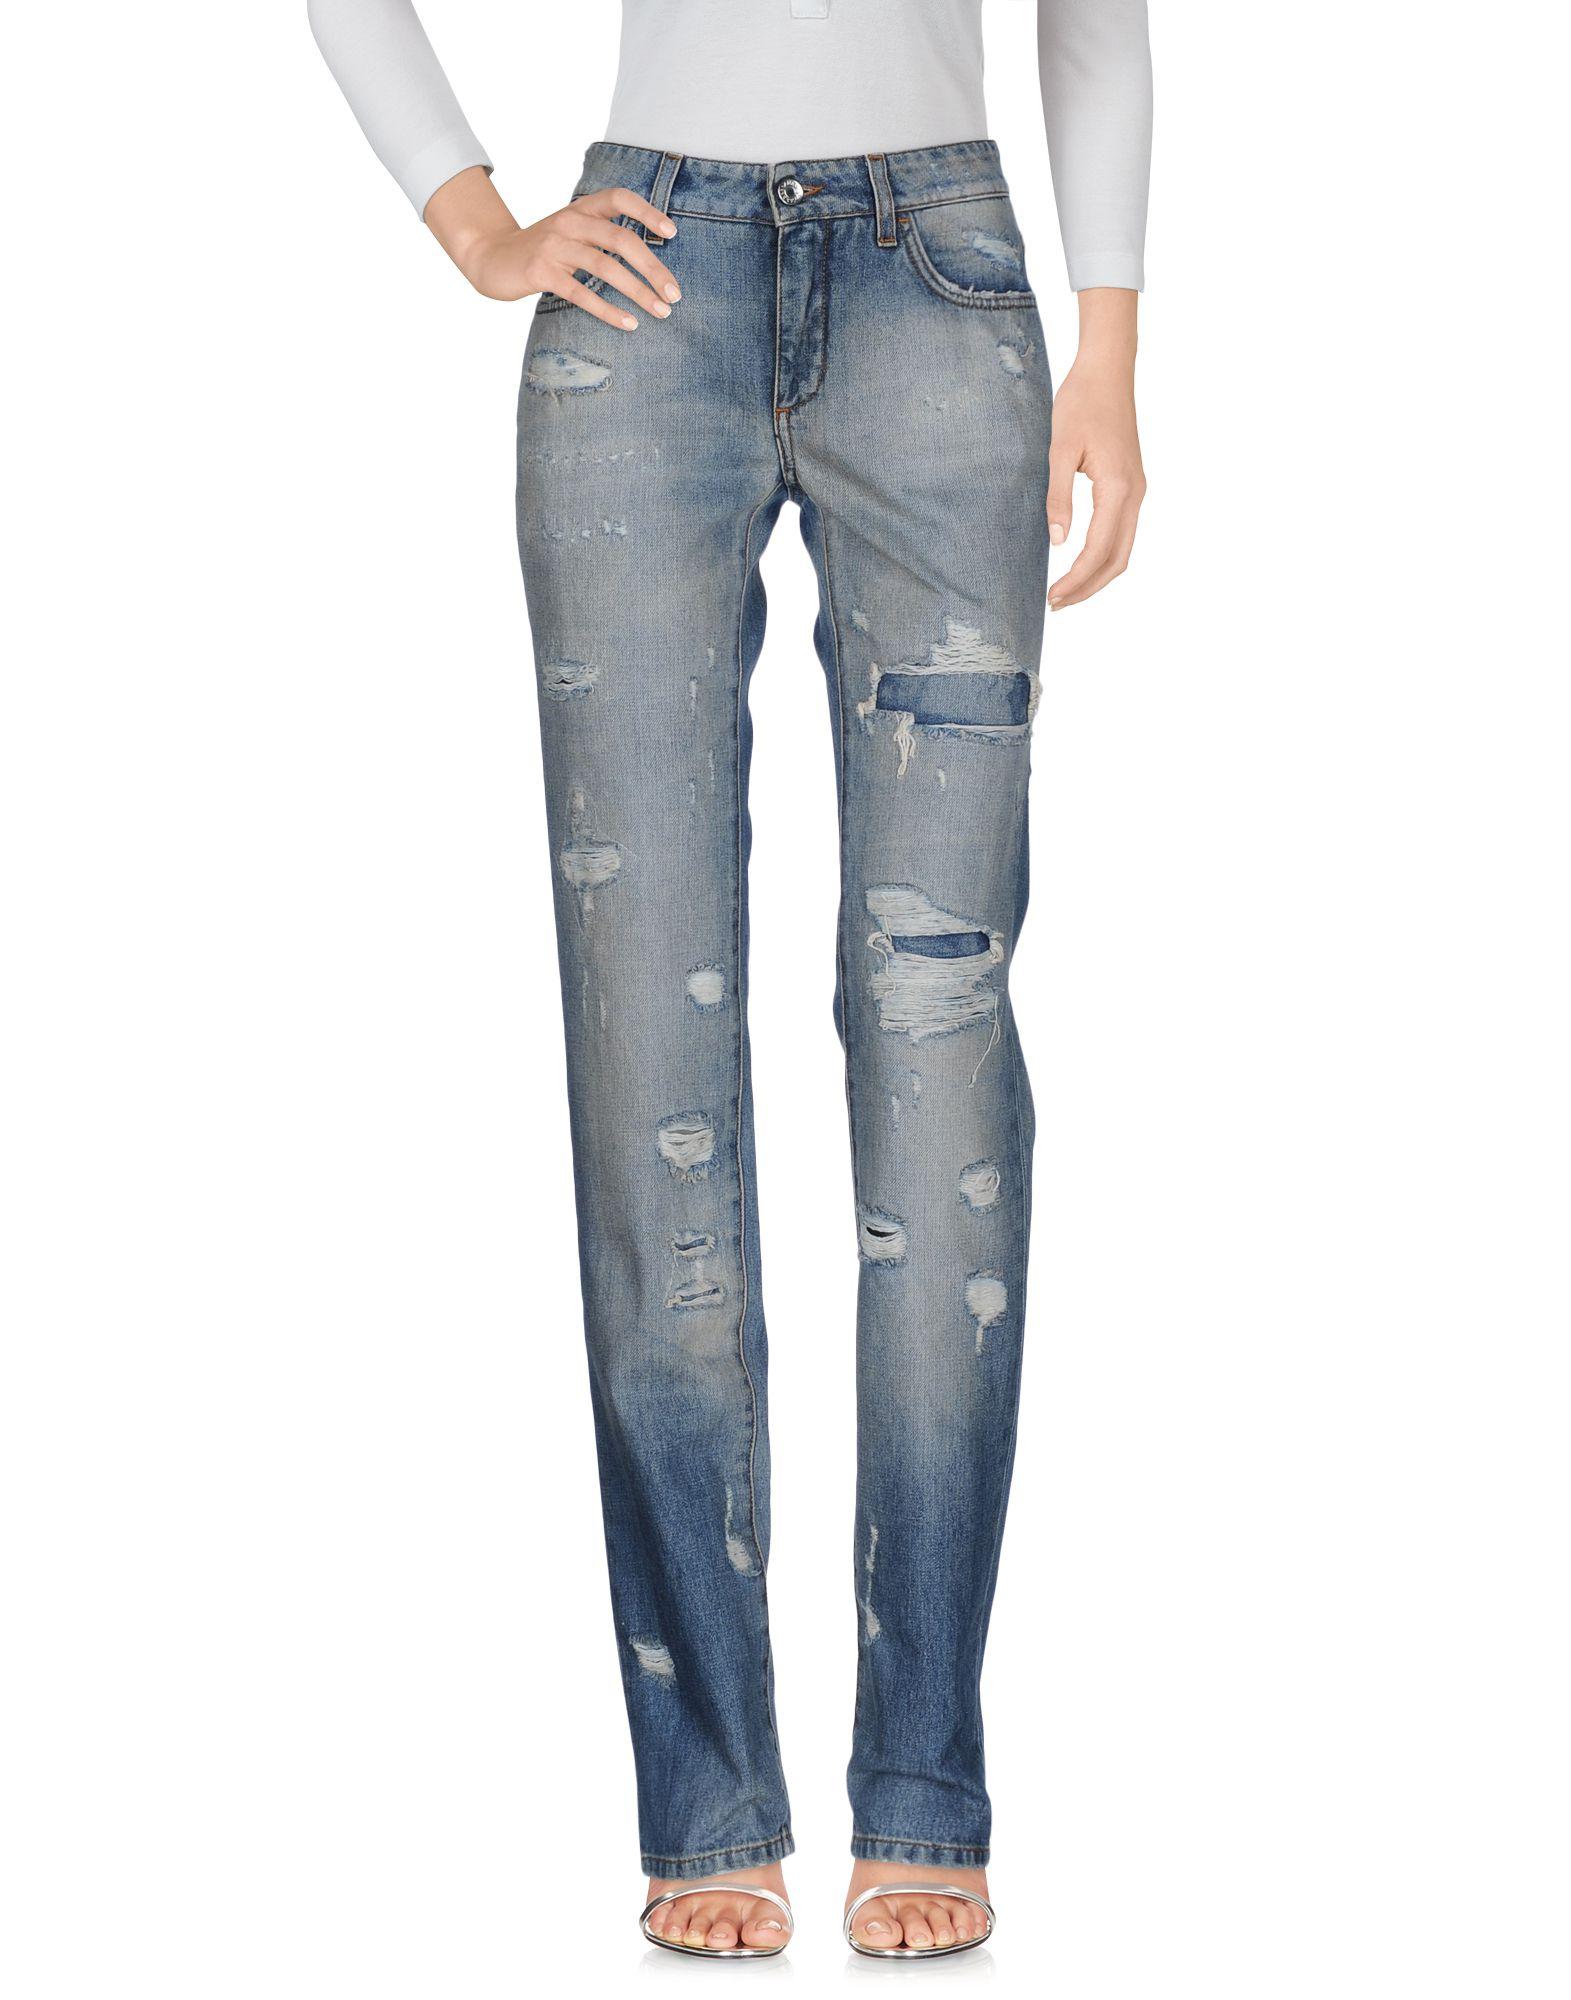 Pantaloni Jeans Dolce & Gabbana Donna - Acquista online su KPIn2vE